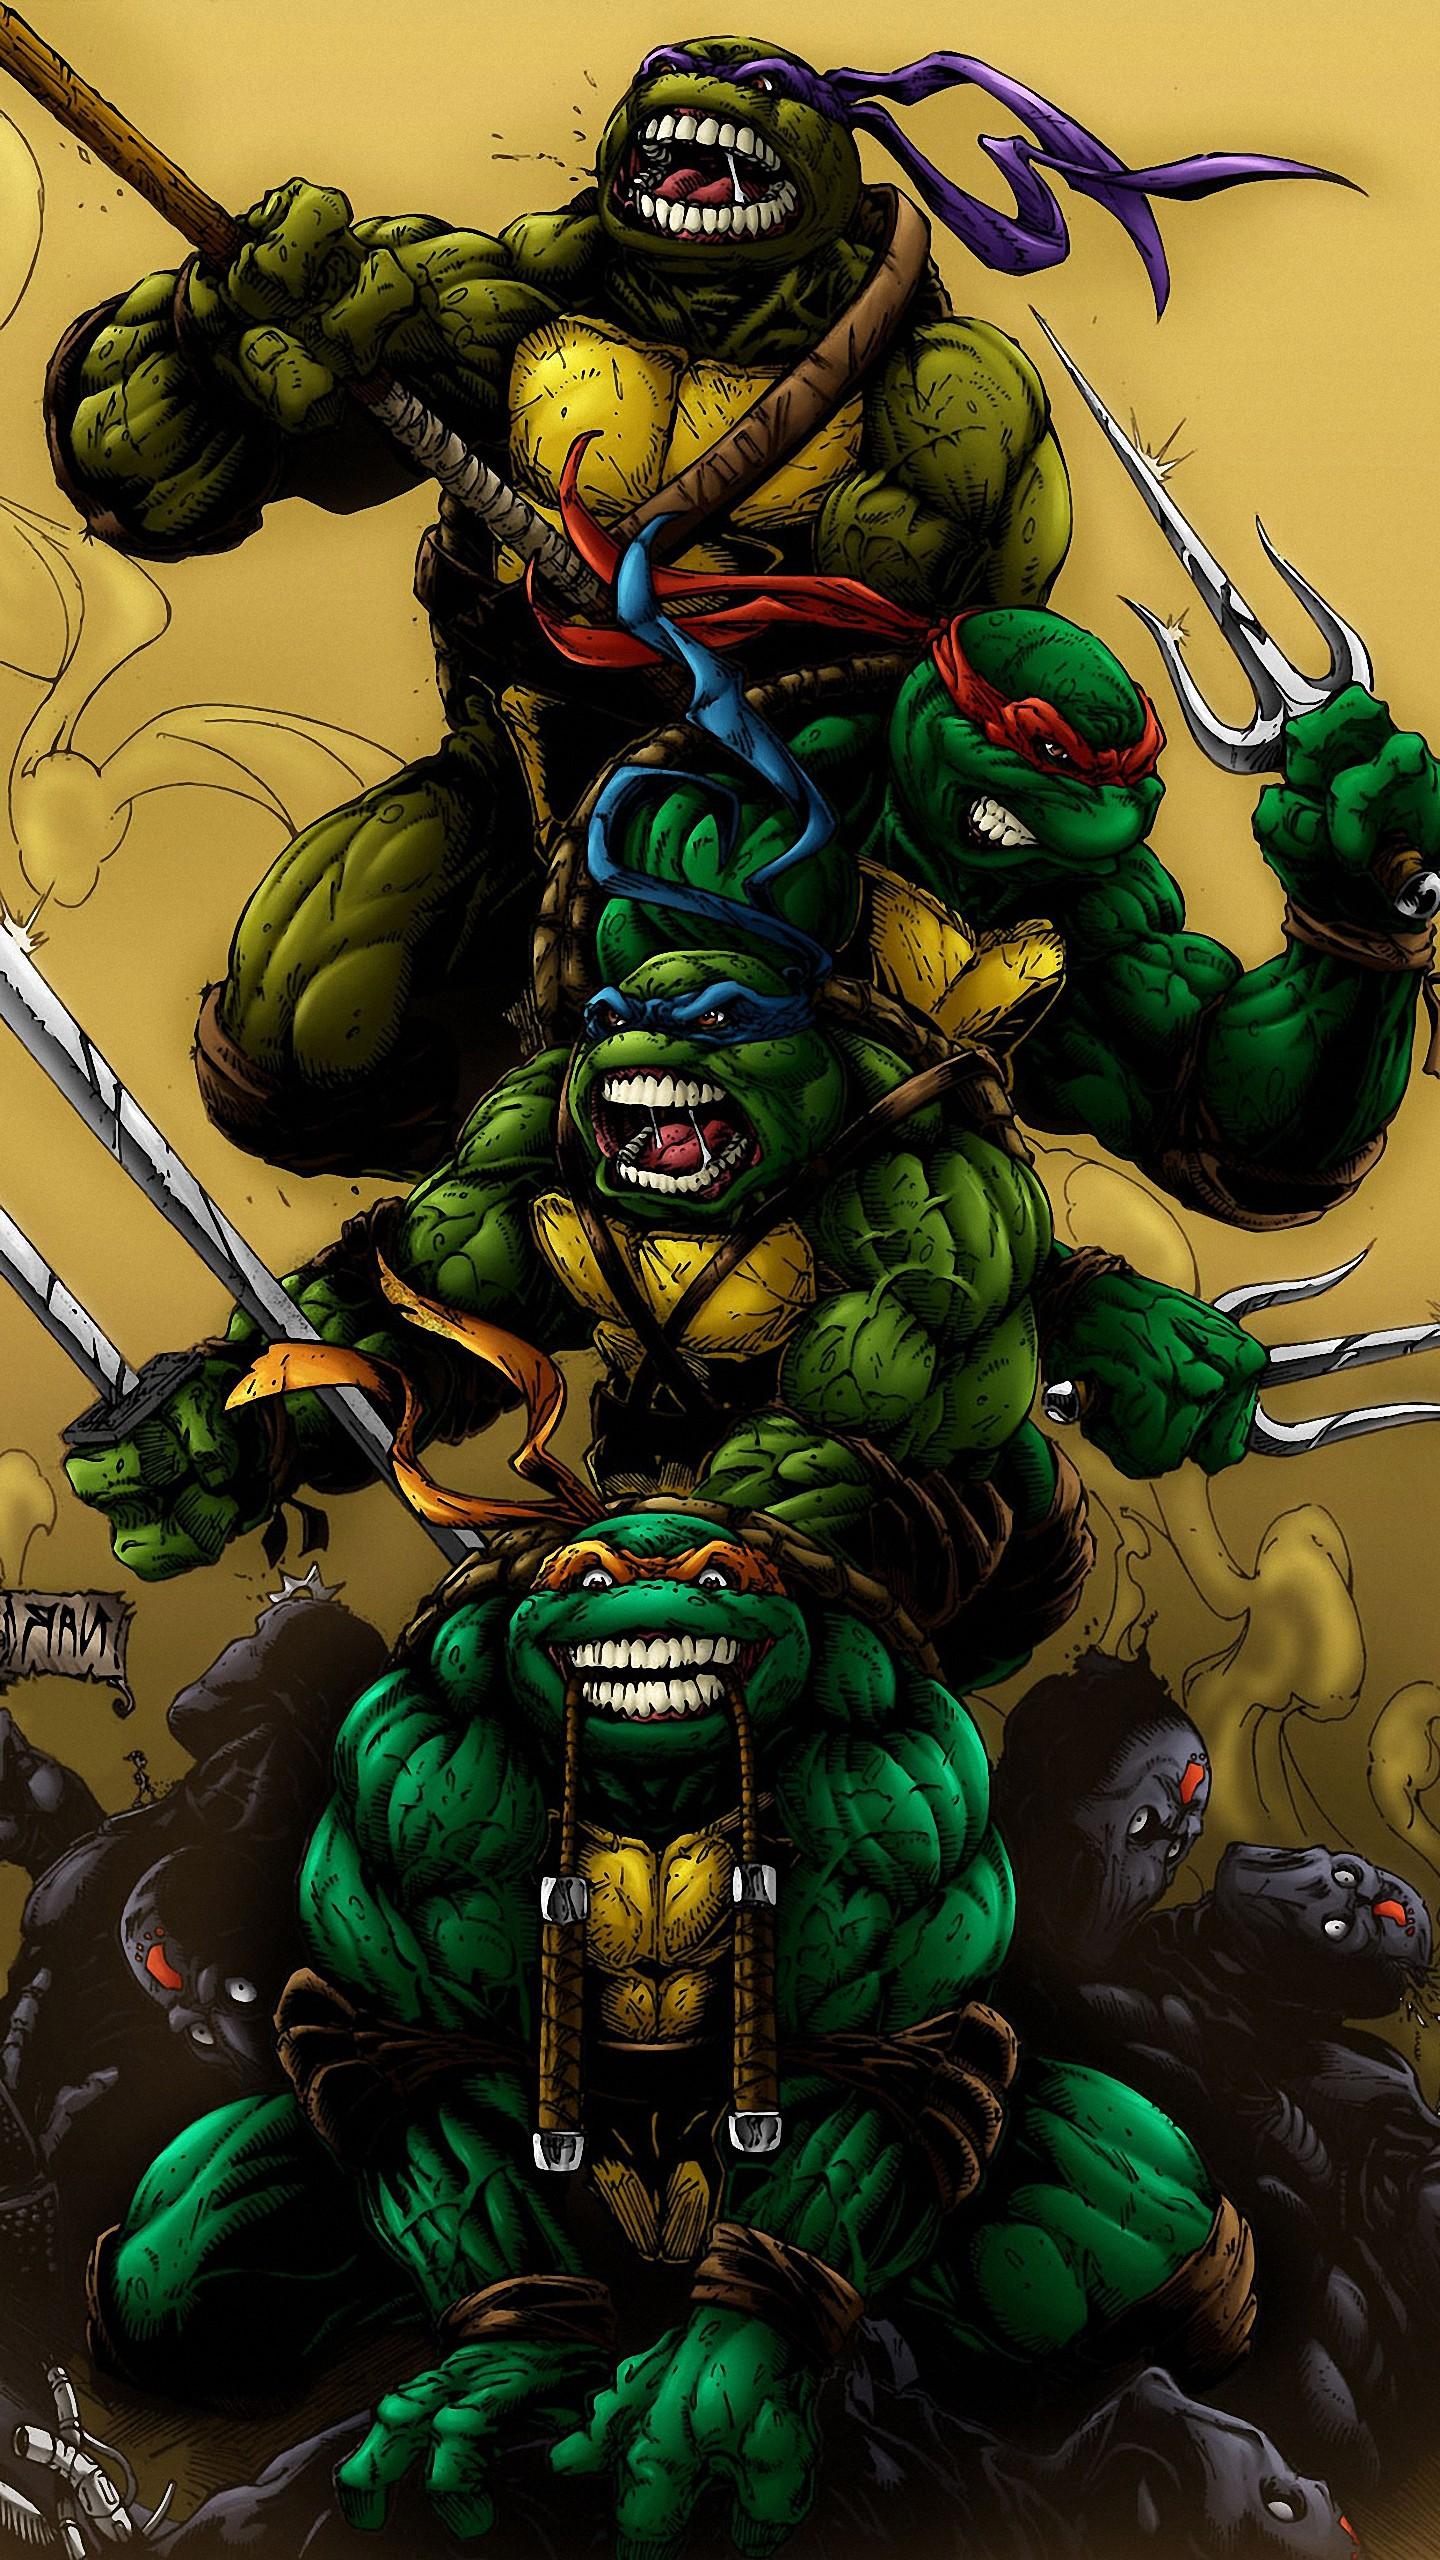 Ninja turtles wallpaper 72 images - Ninja turtles wallpaper ...